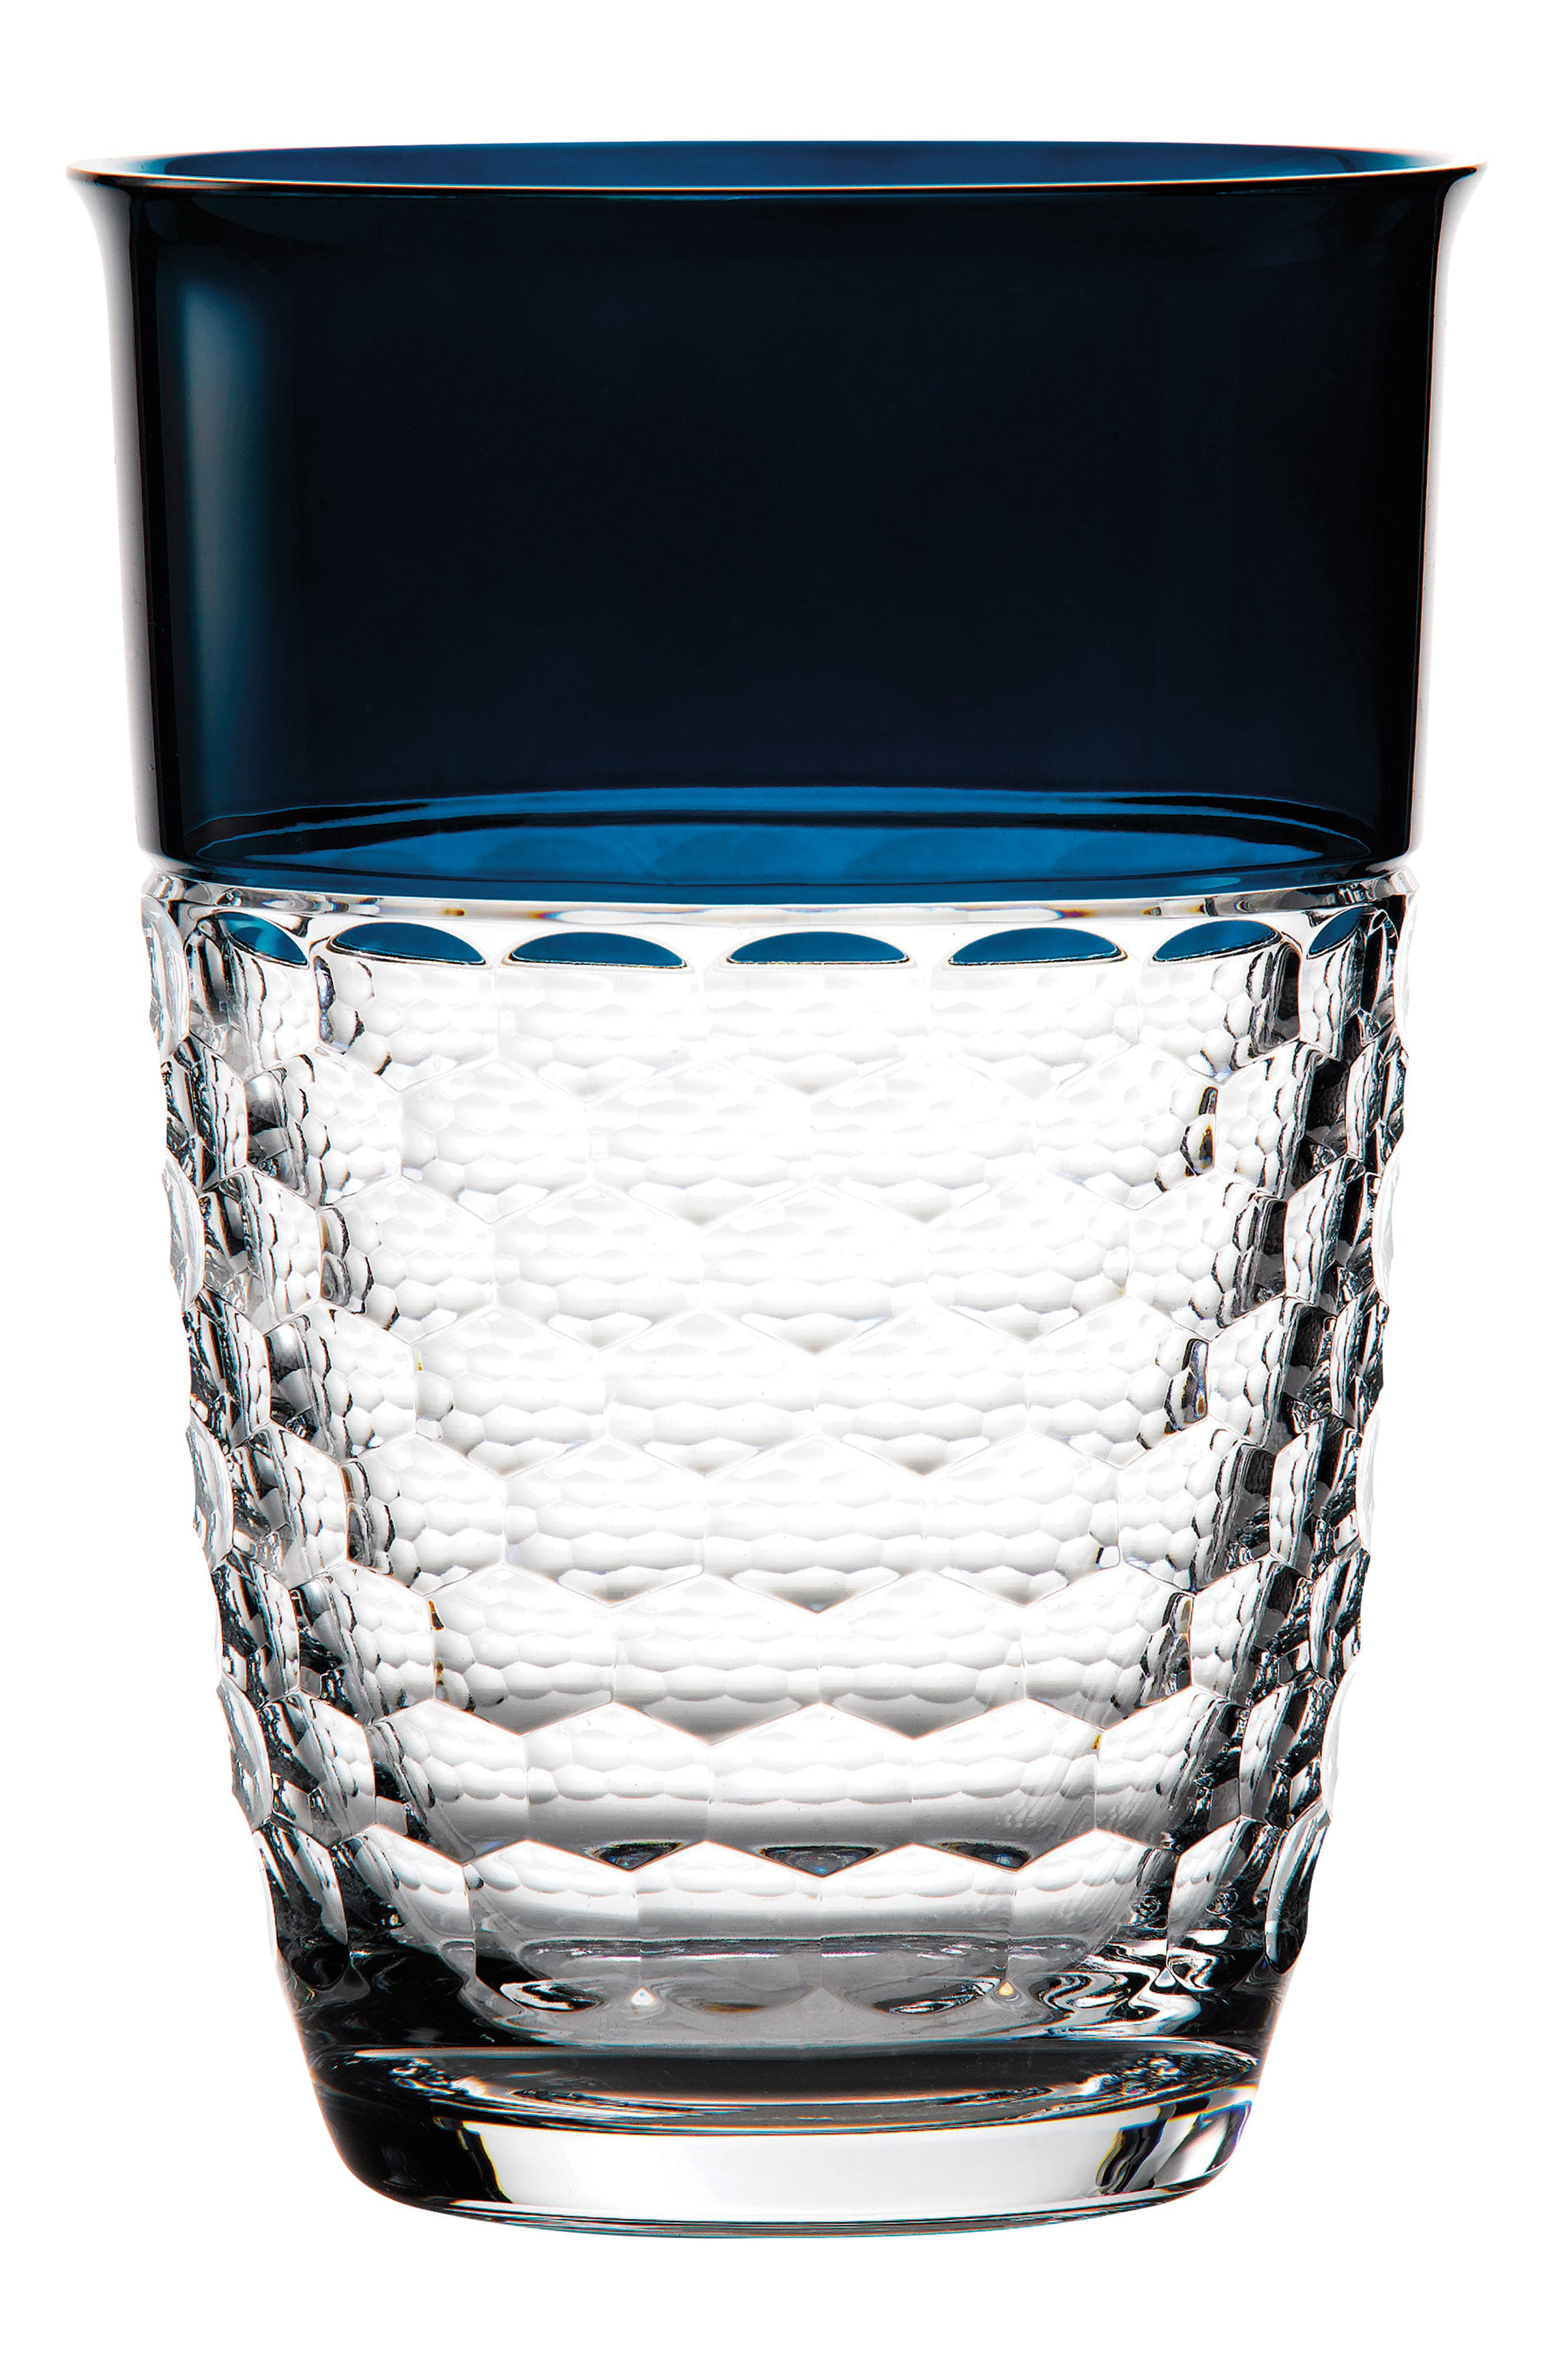 Main Image - Waterford Jo Sampson Half & Half Teal Lead Crystal Vase